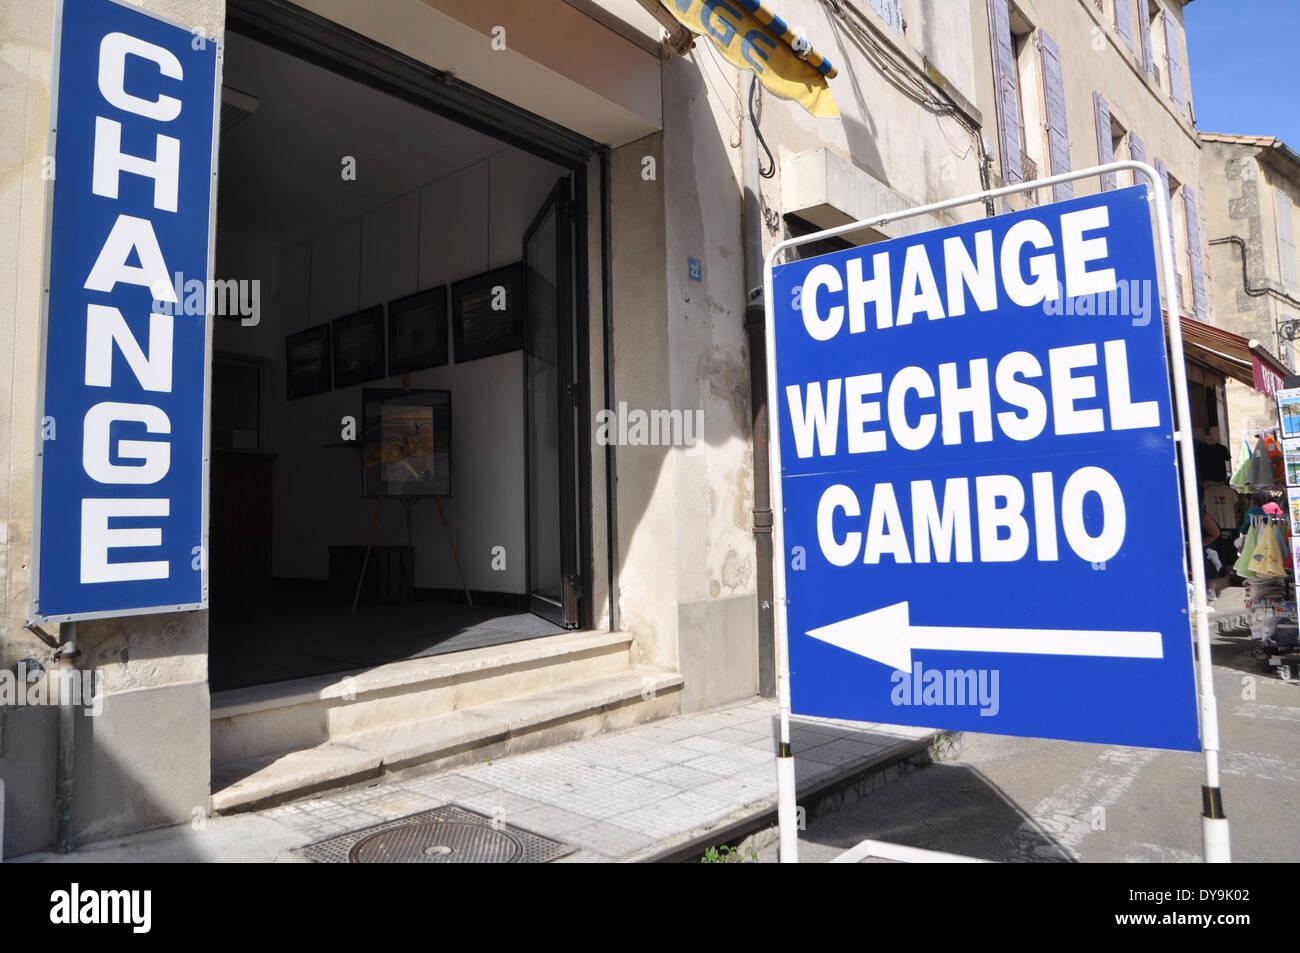 A pavement sidewalk sign outside a bureau de change in arles